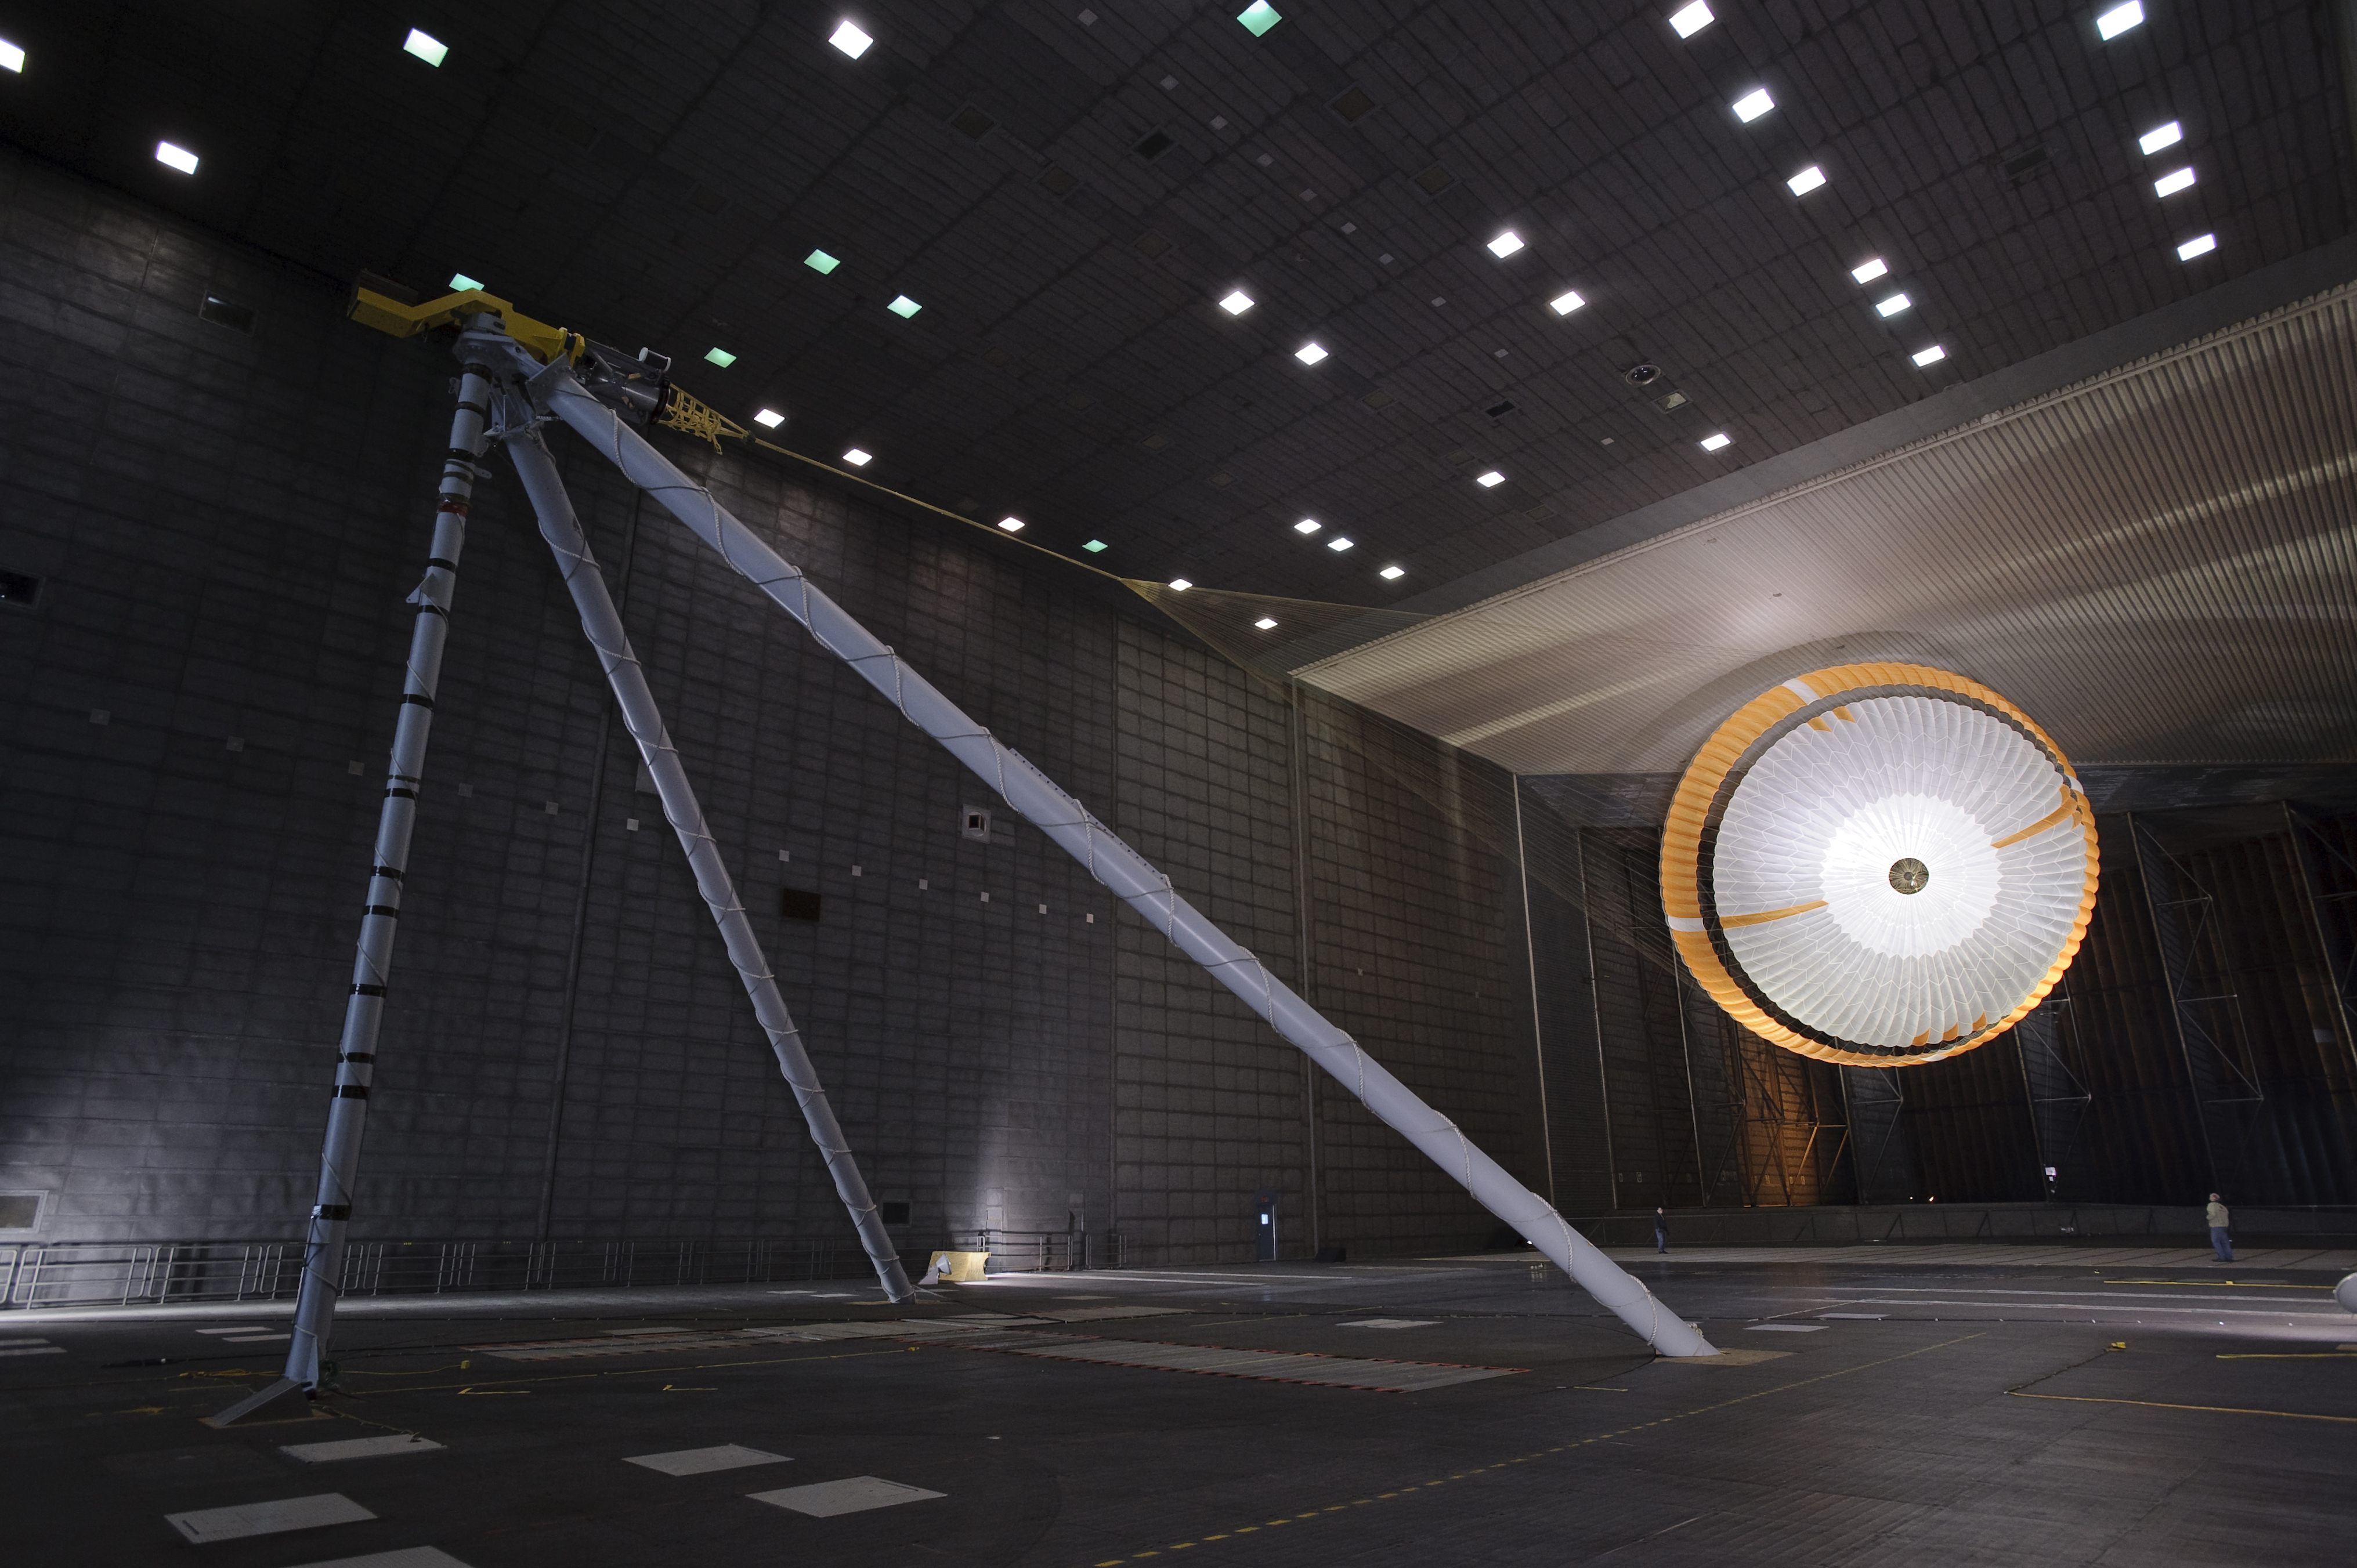 NASA - Mars Science Laboratory Parachute Qualification Testing